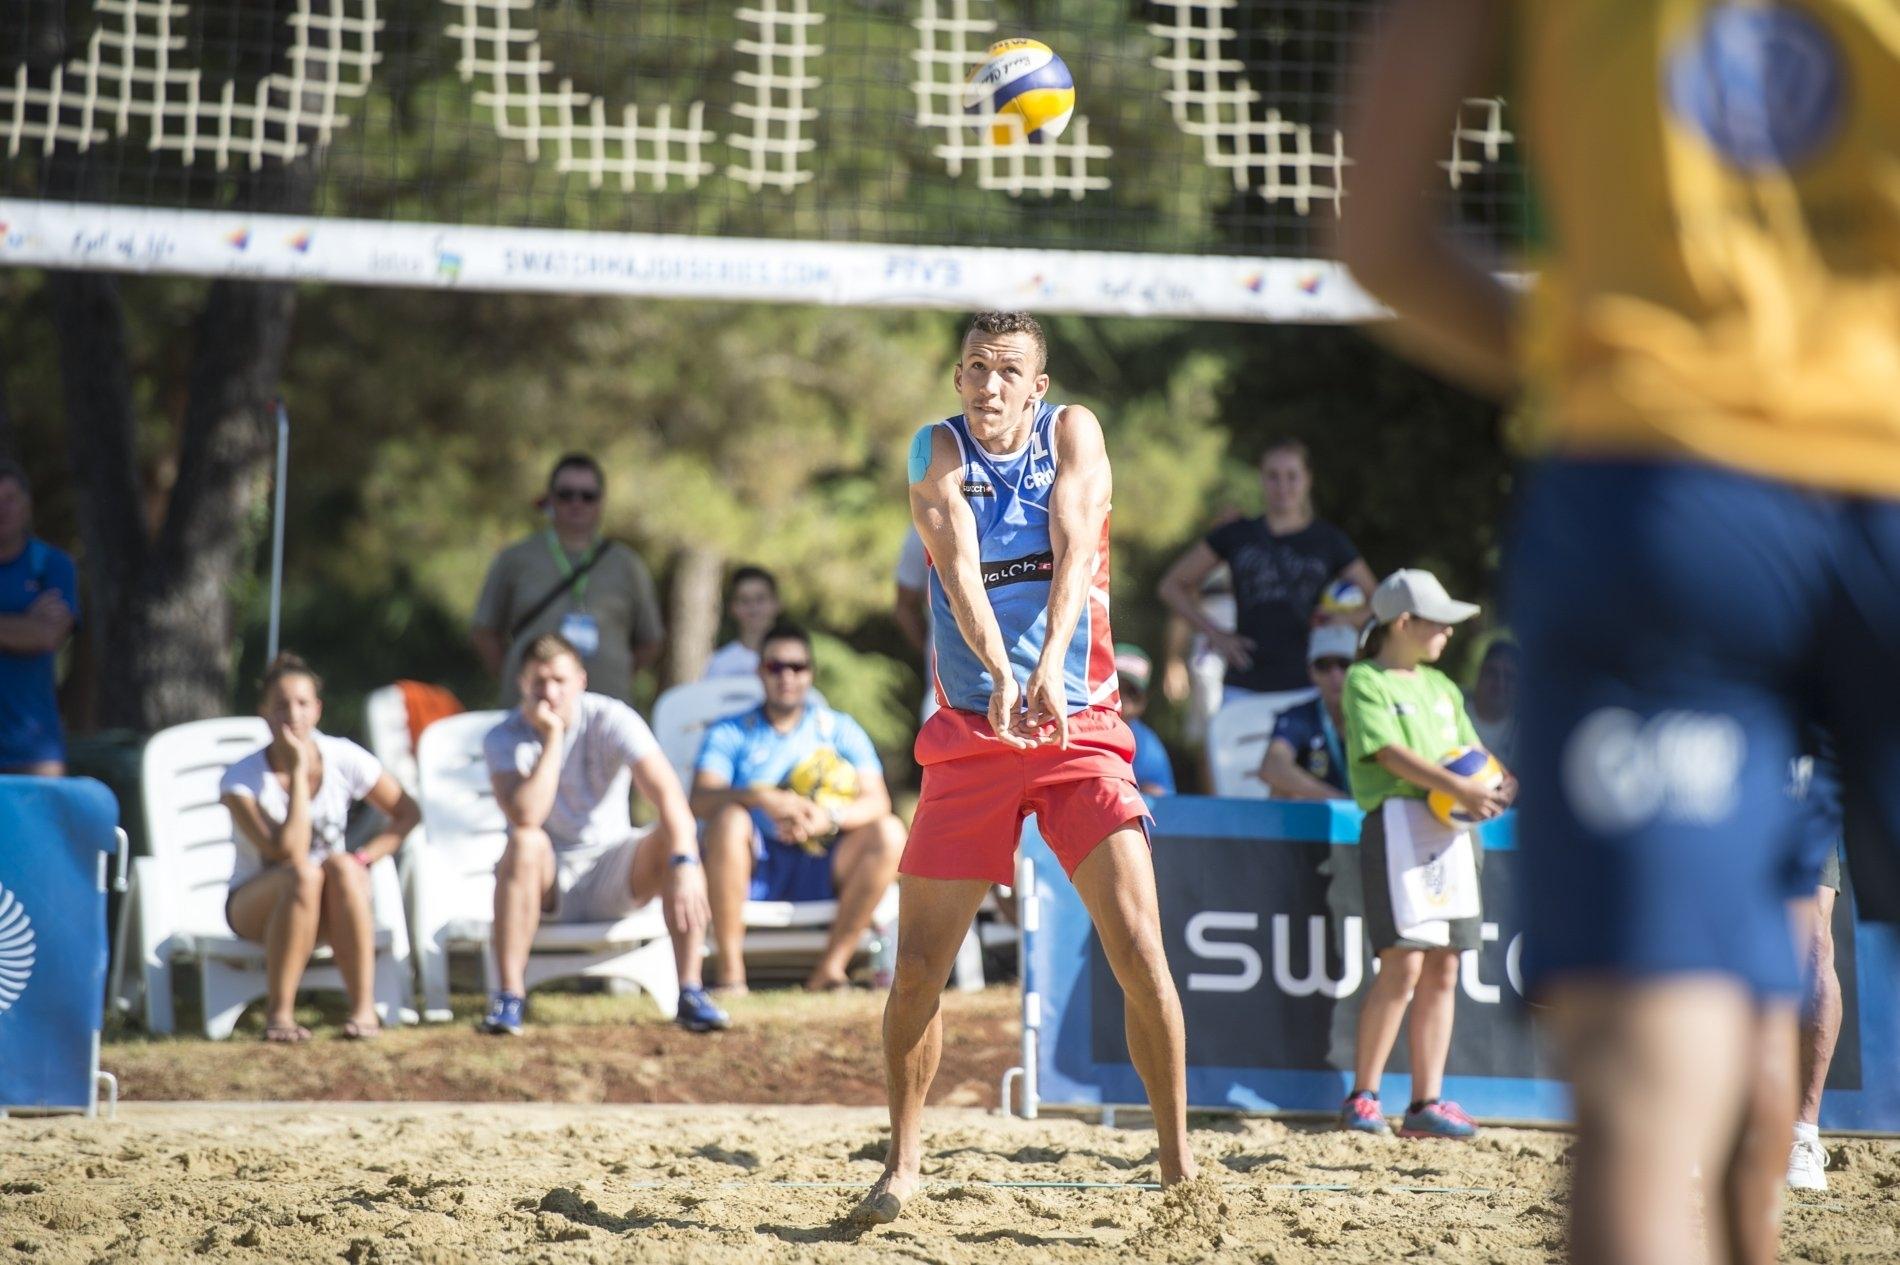 [VIDEO] Croatia Star Ivan Perišić Makes International Beach Volleyball Debut